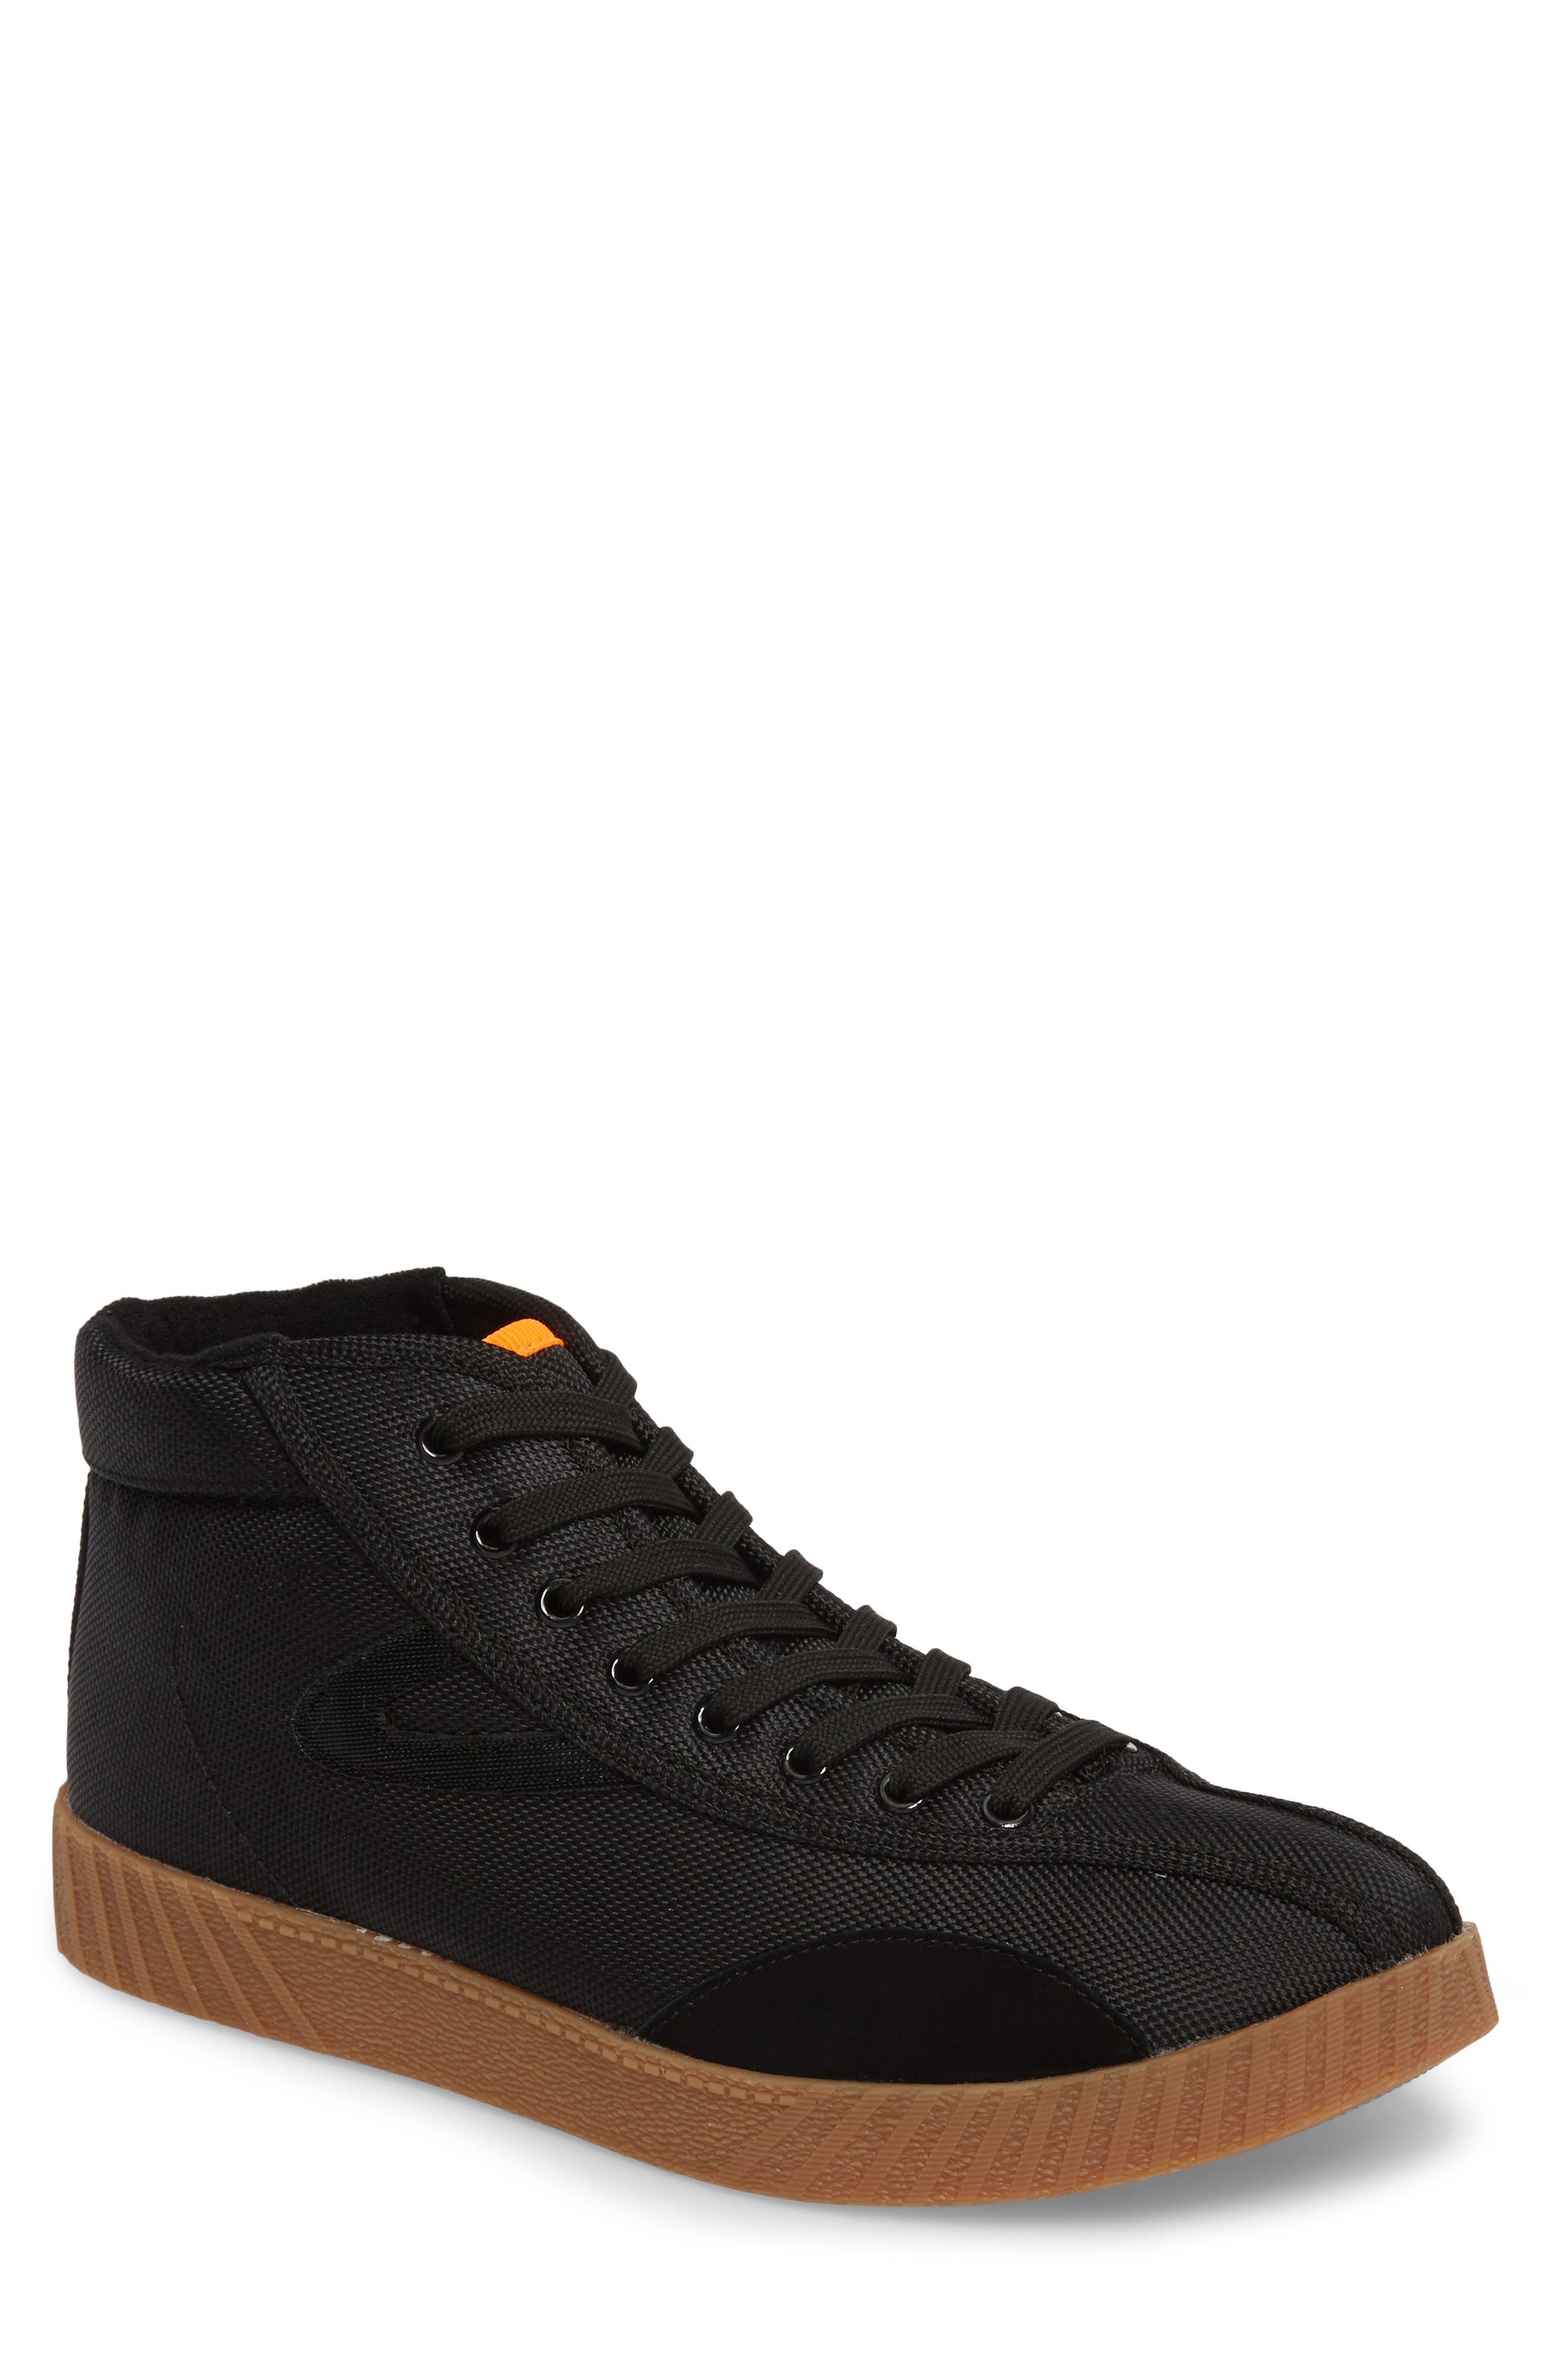 Andre 3000 Nylite High Top Sneaker,                             Main thumbnail 1, color,                             Black/ Neon Orange Nylon